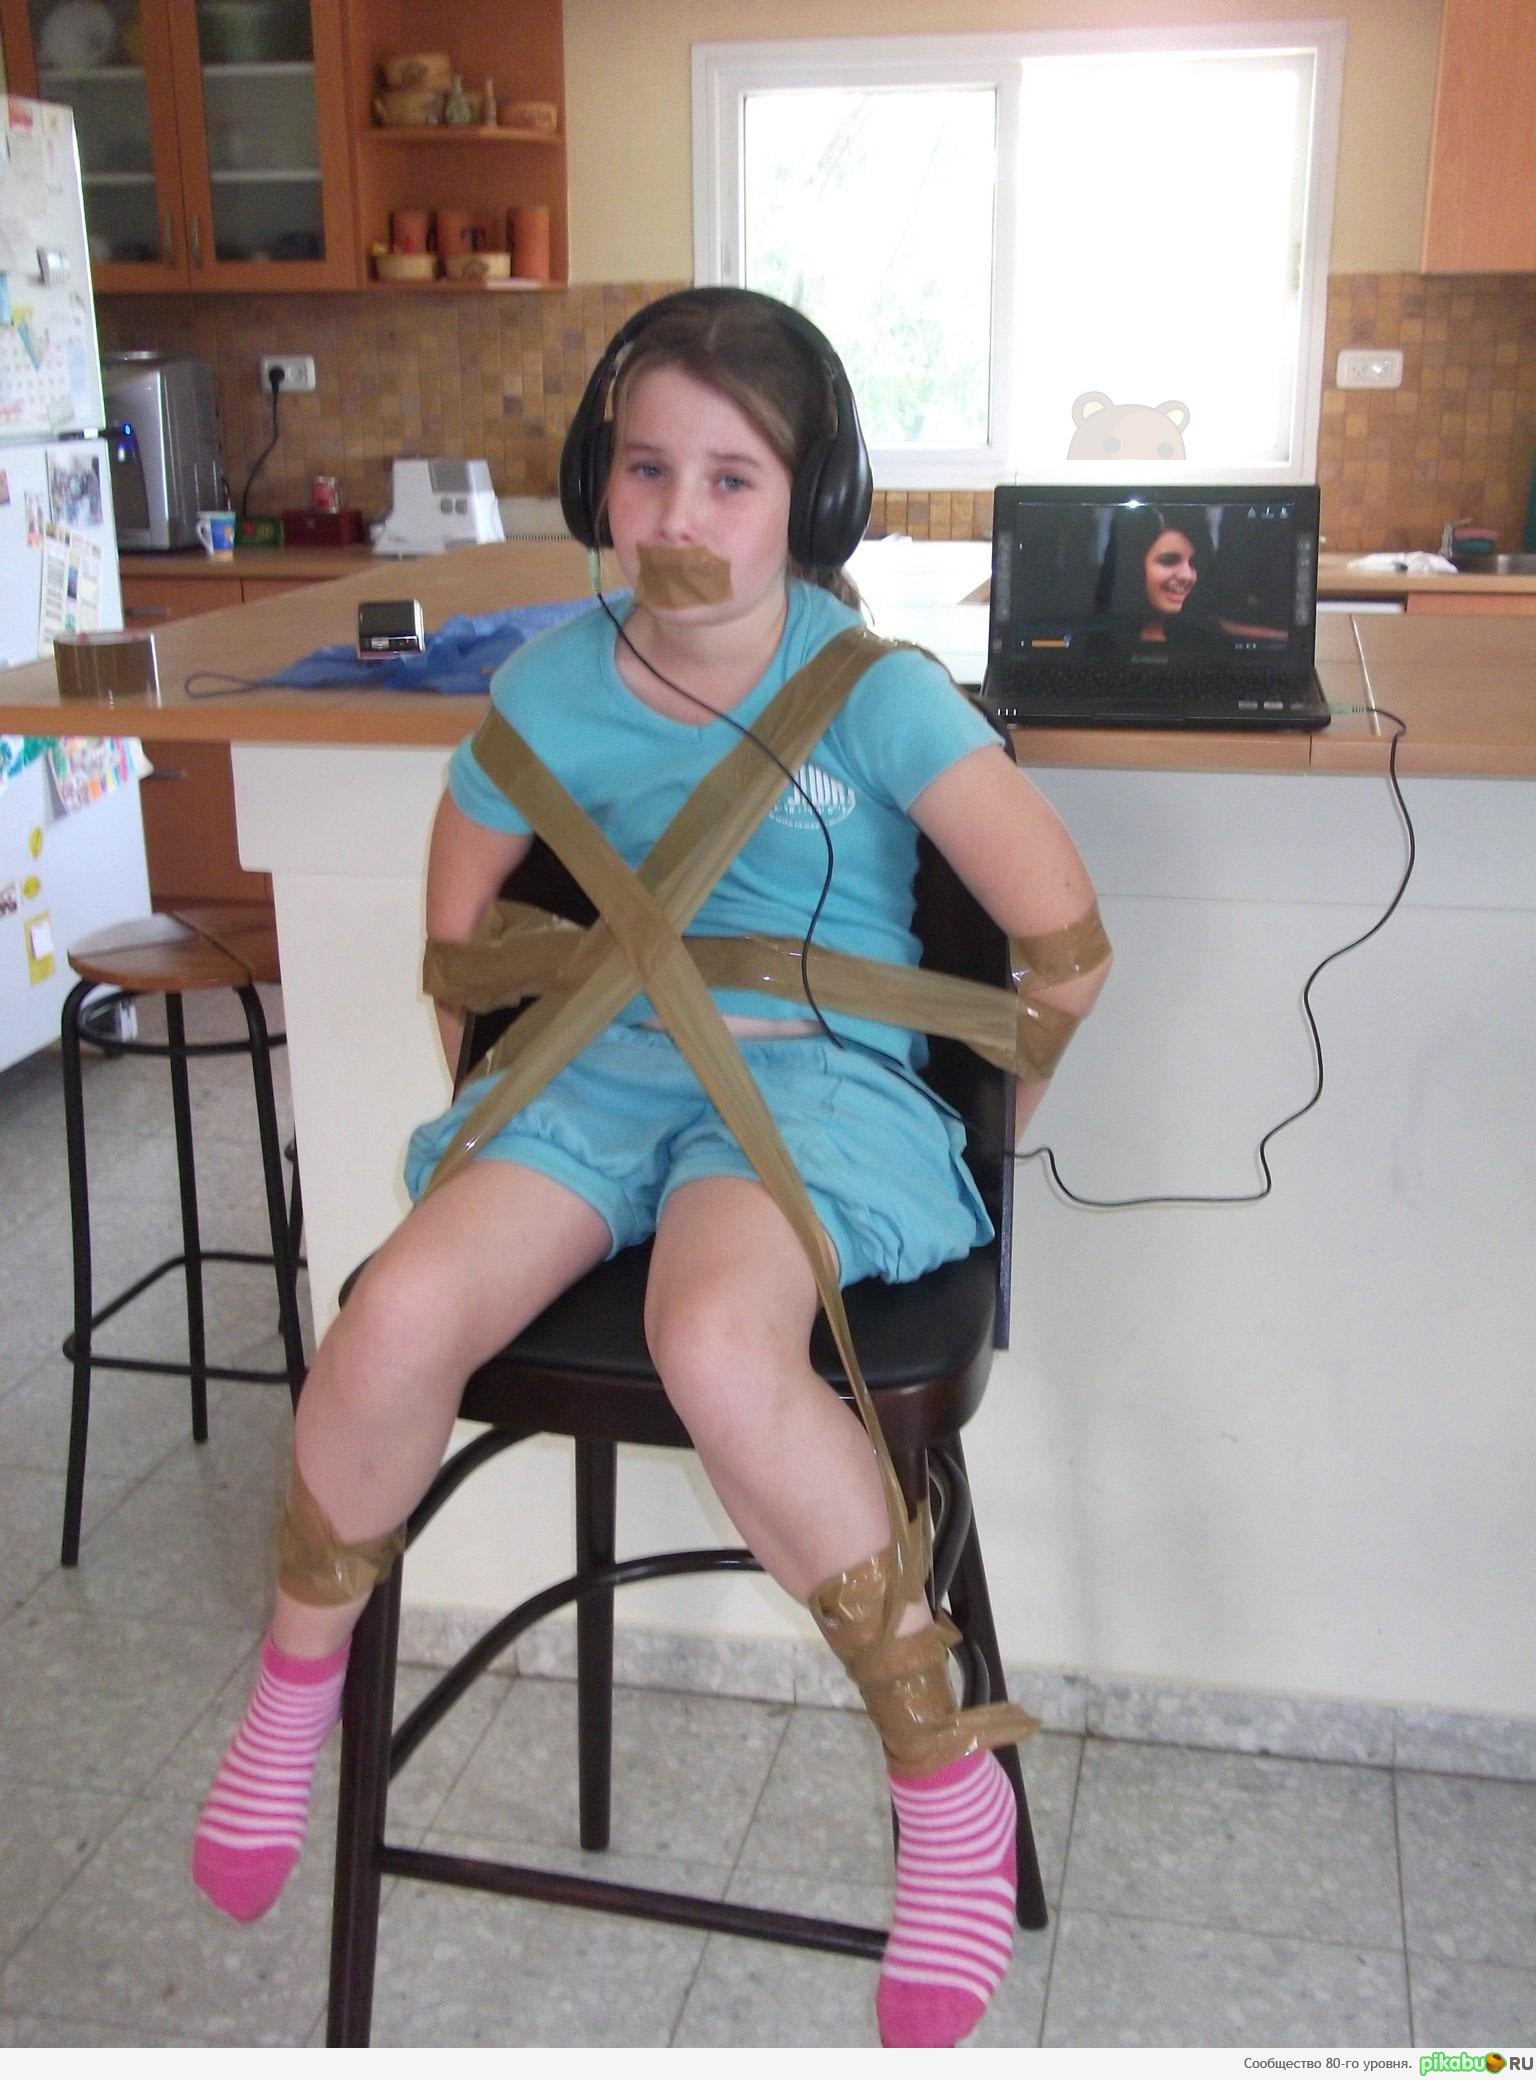 Фото девушки с бодуна 19 фотография